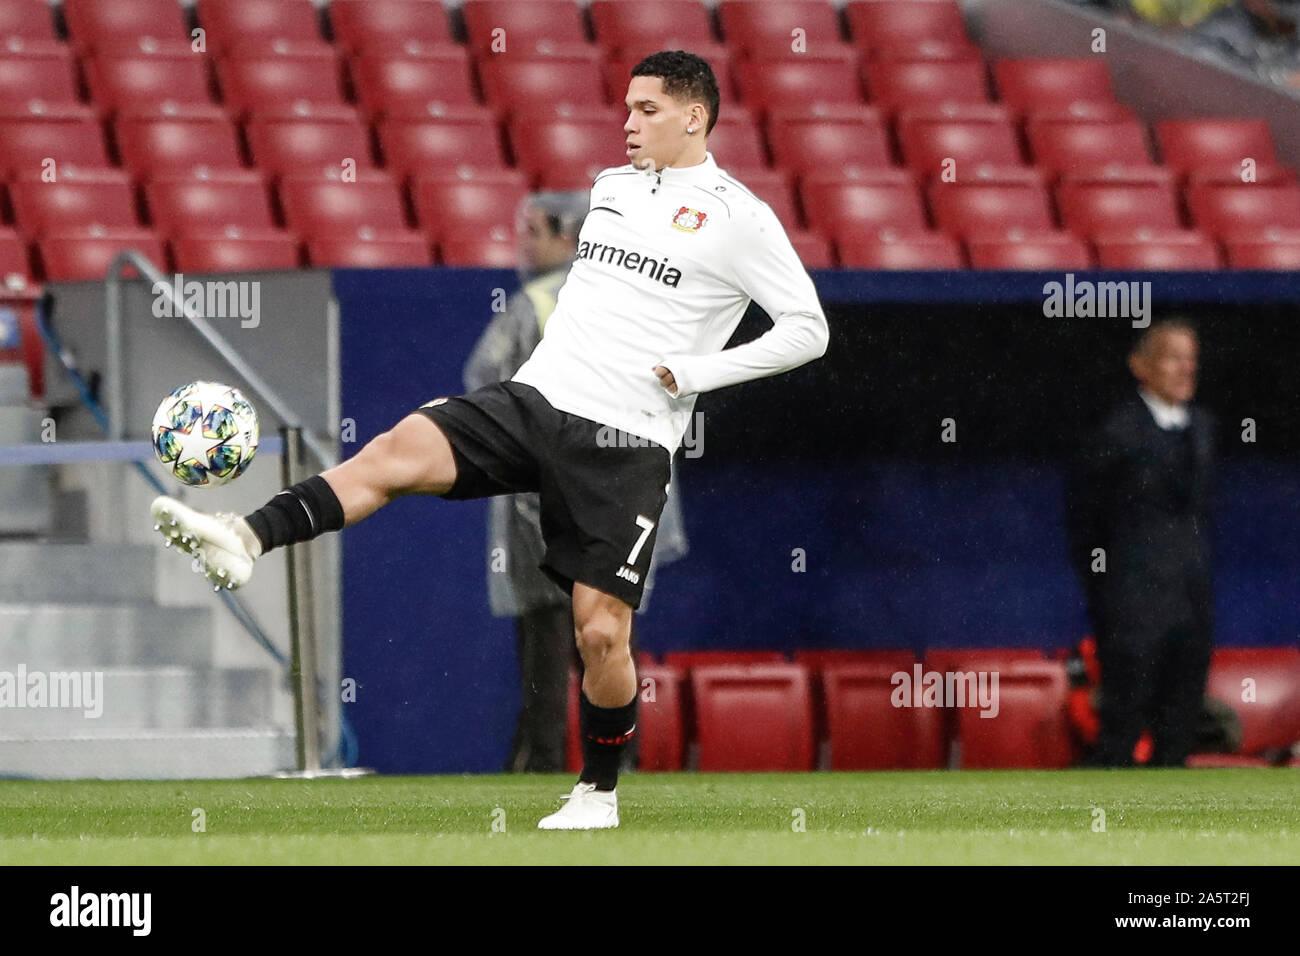 Paulinho Bayer 04 Leverkusen High Resolution Stock Photography and ...